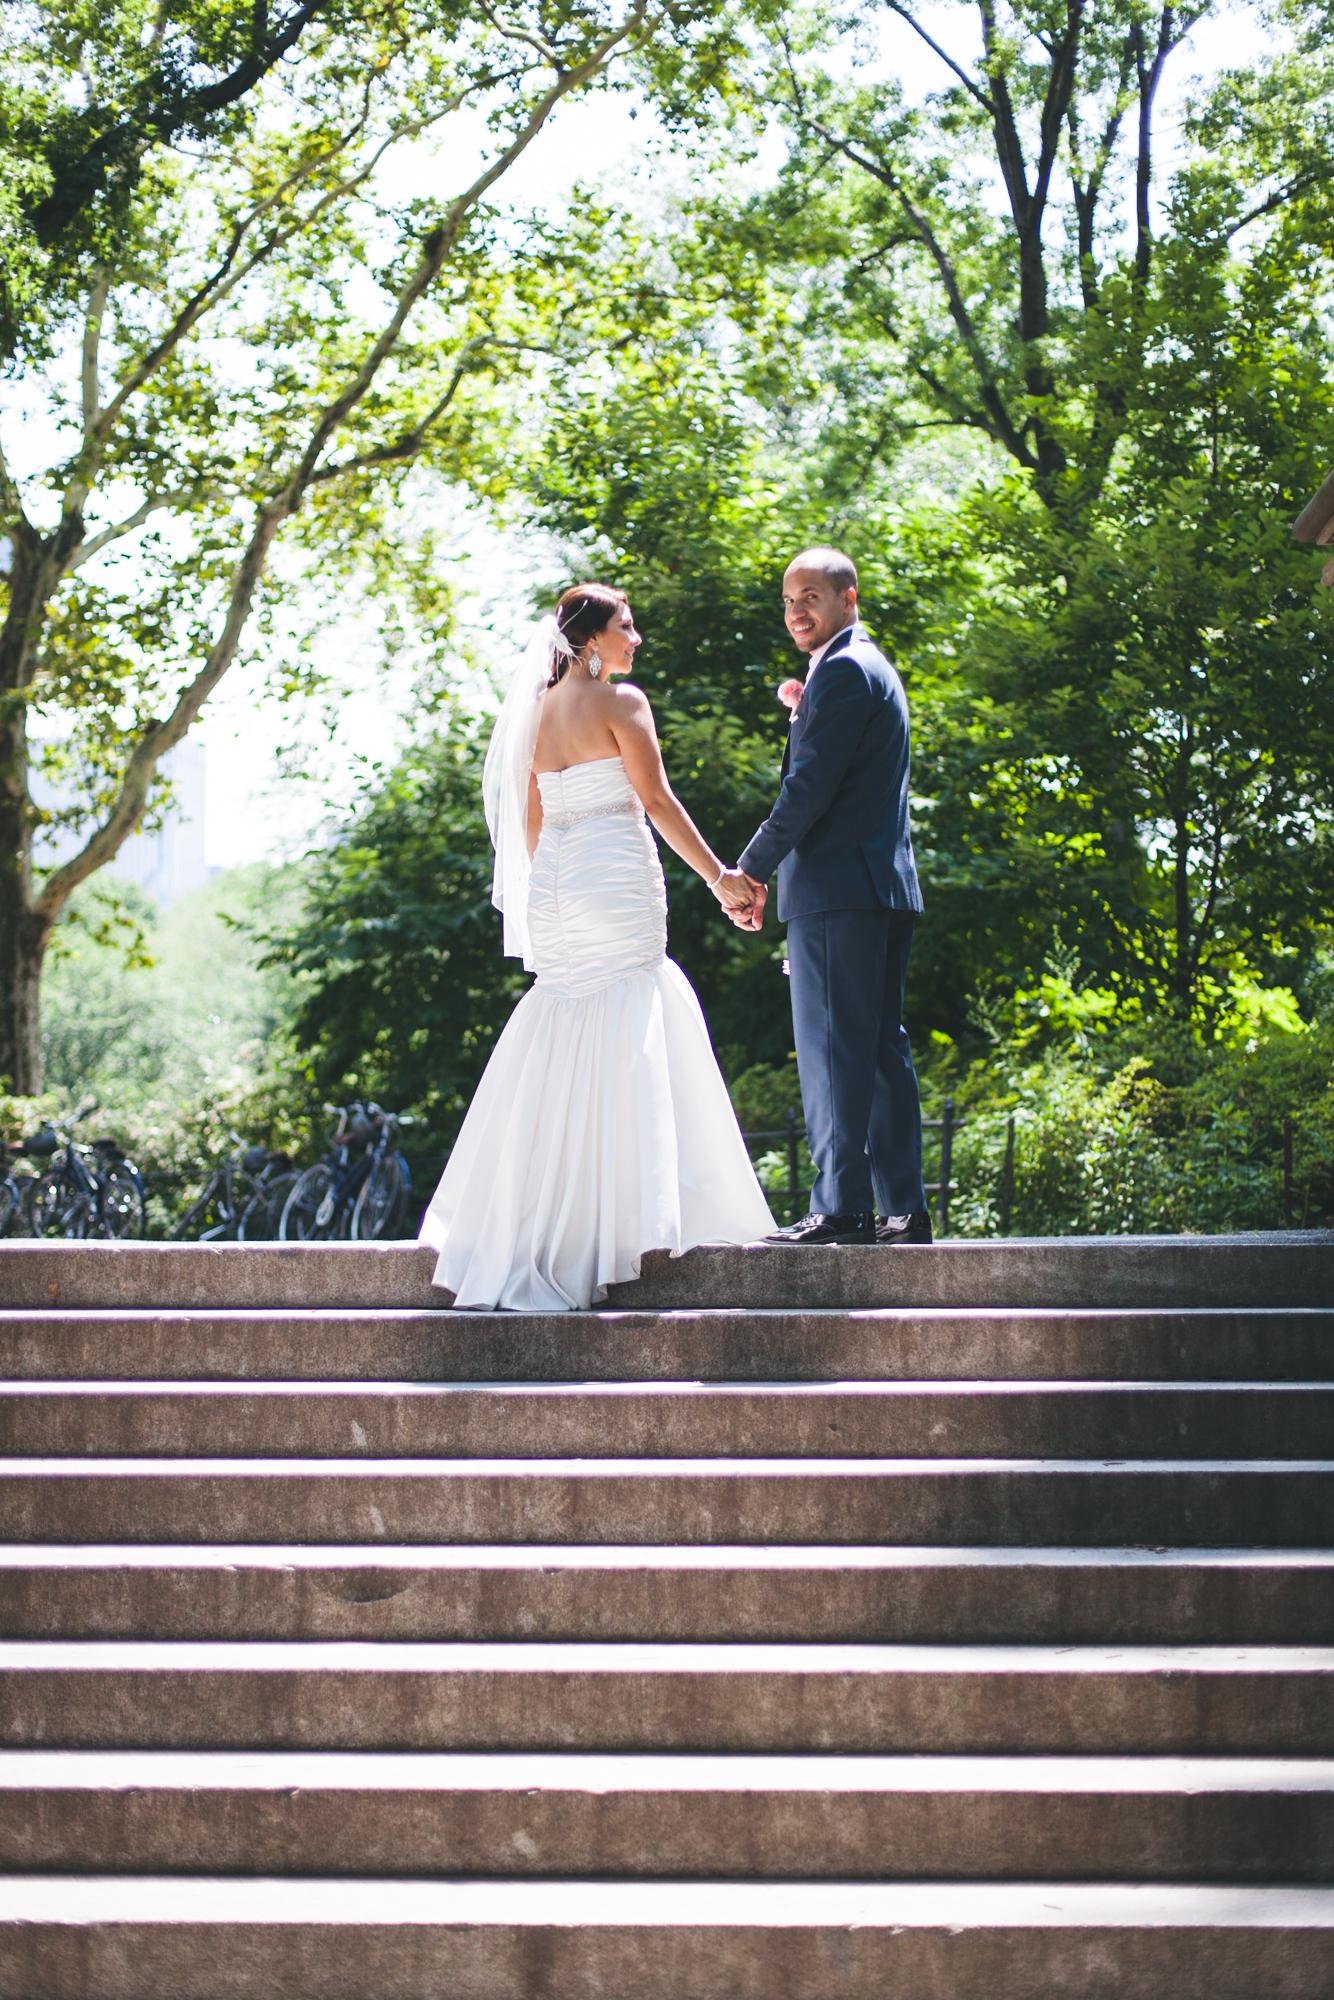 PriscillaJeffrey-Central-Park-Wedding-Elopement-Photography-NYC-40.jpg